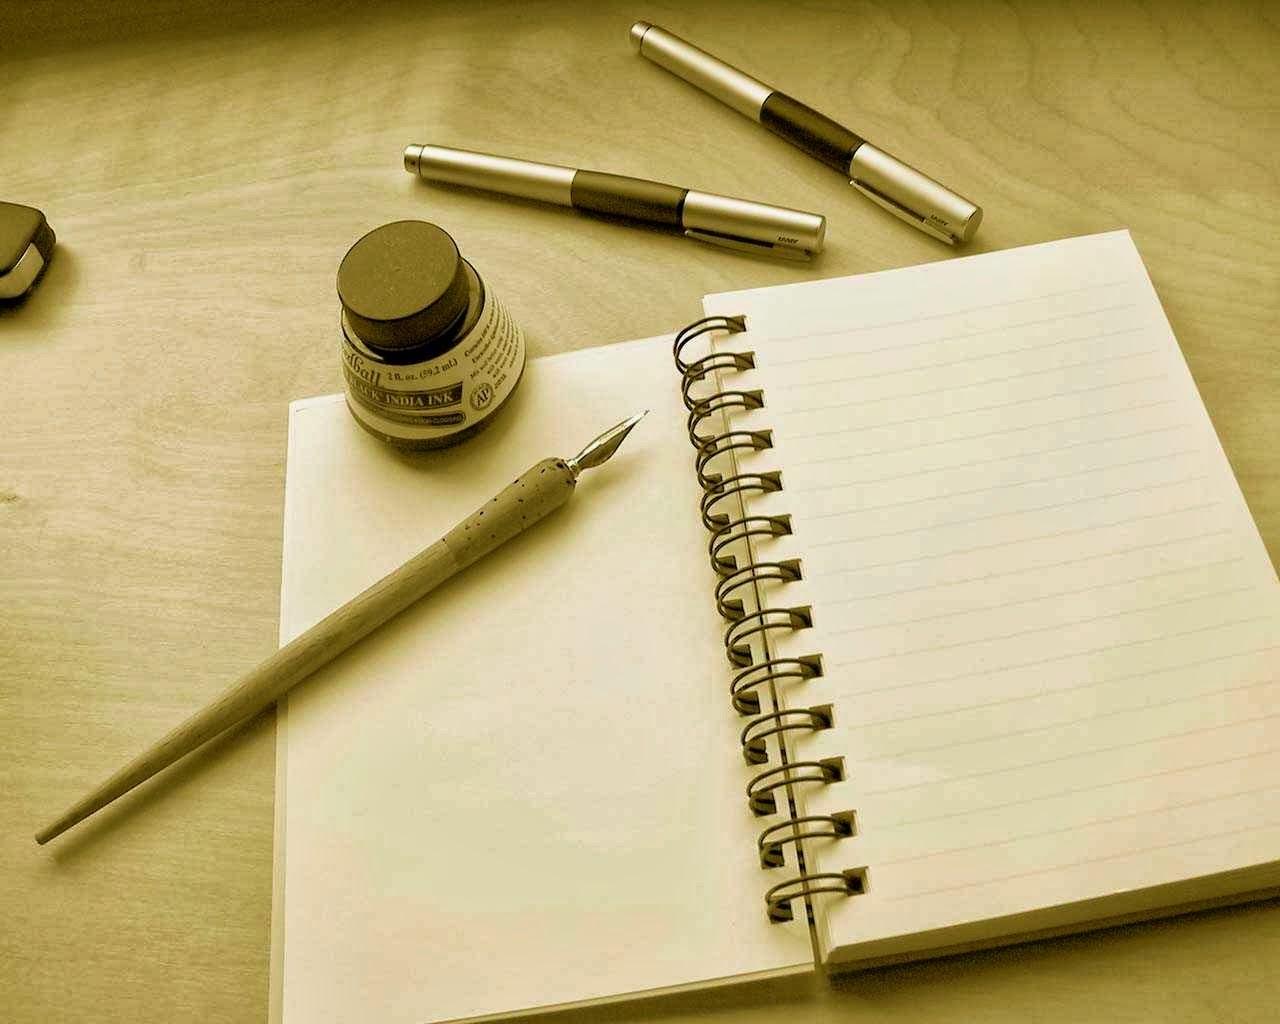 hacer-narración-marca-relato-interesante